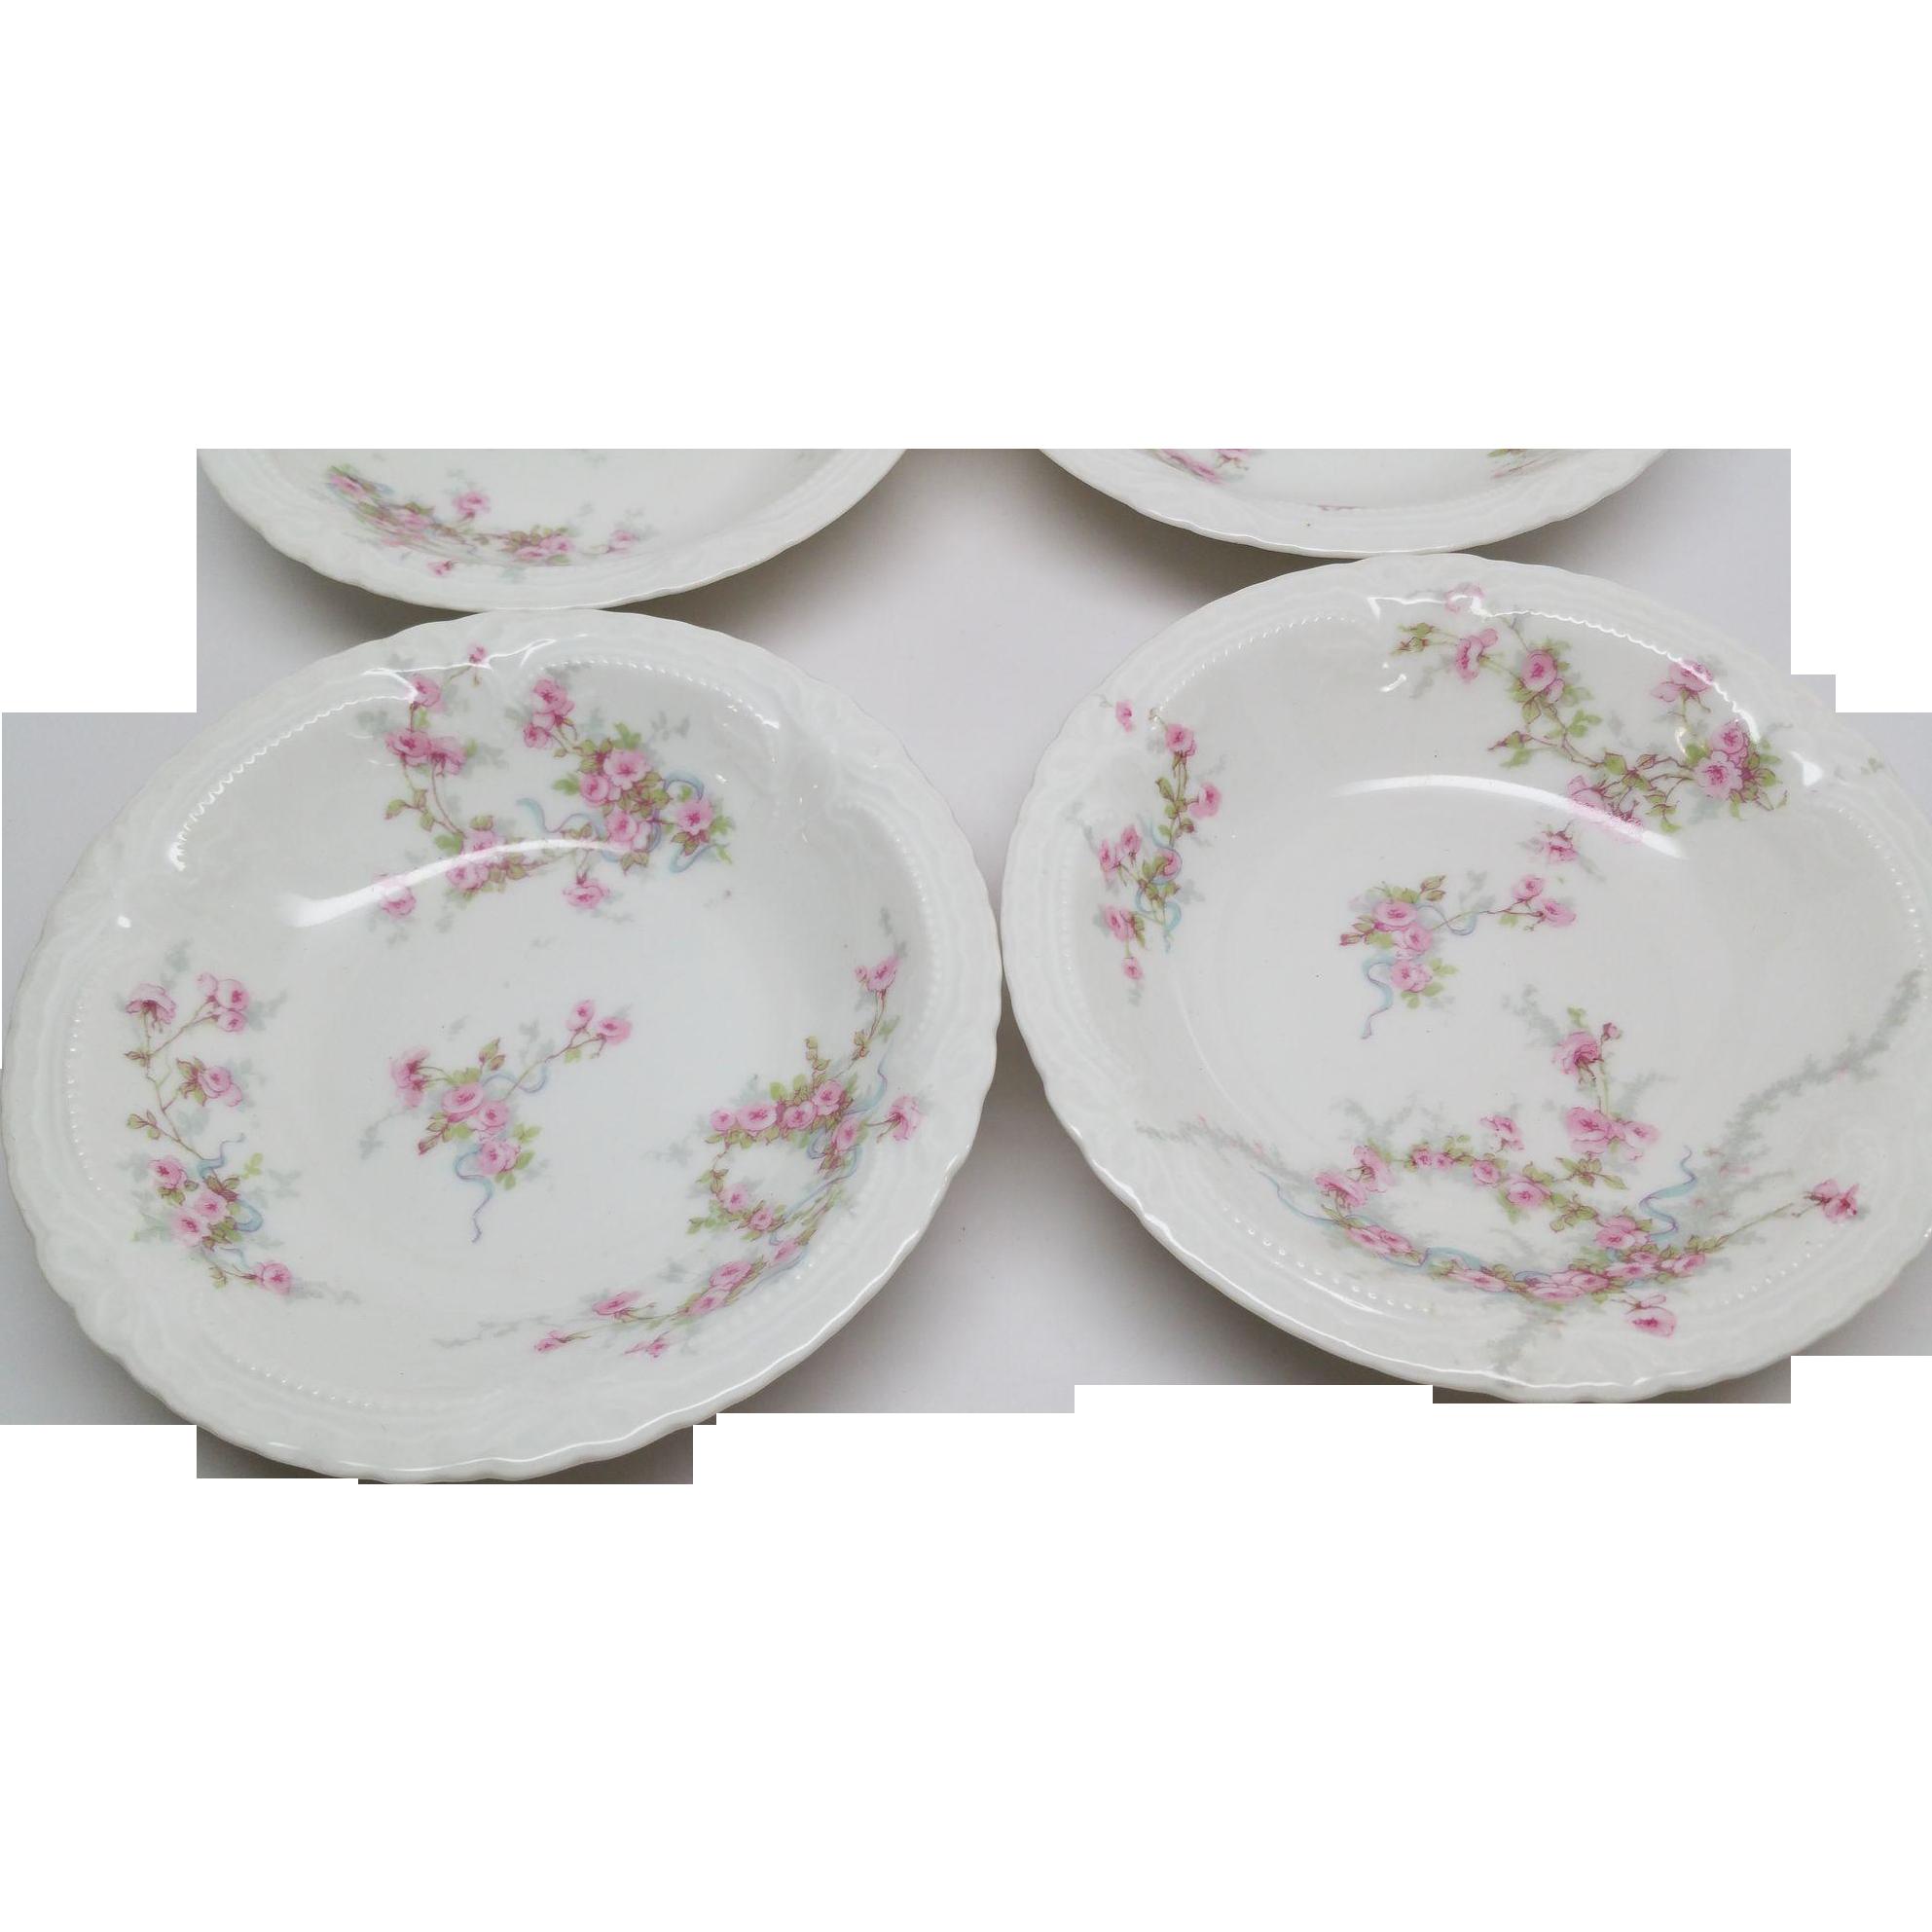 Haviland Limoges 6 Berry Bowls LAMBELLE  Blue Ribbons Pink Roses 1903